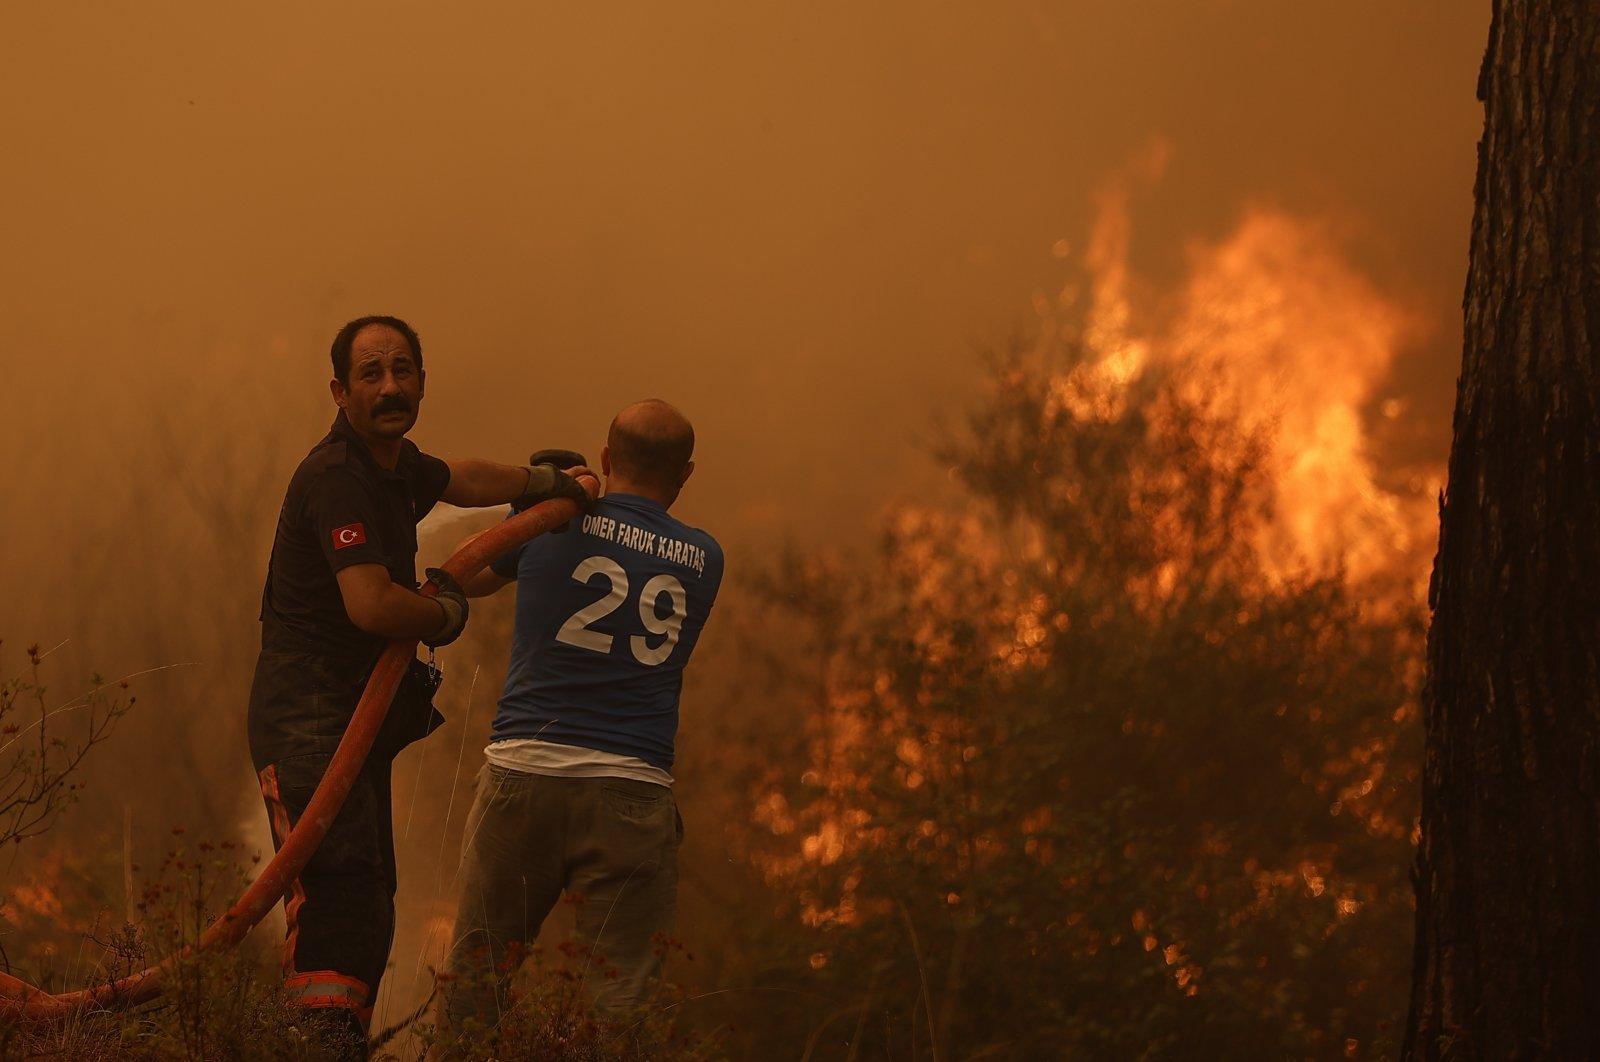 Firefighters battle flames in Manavgat, Antalya, southern Turkey, Aug. 3, 2021. (AA PHOTO)